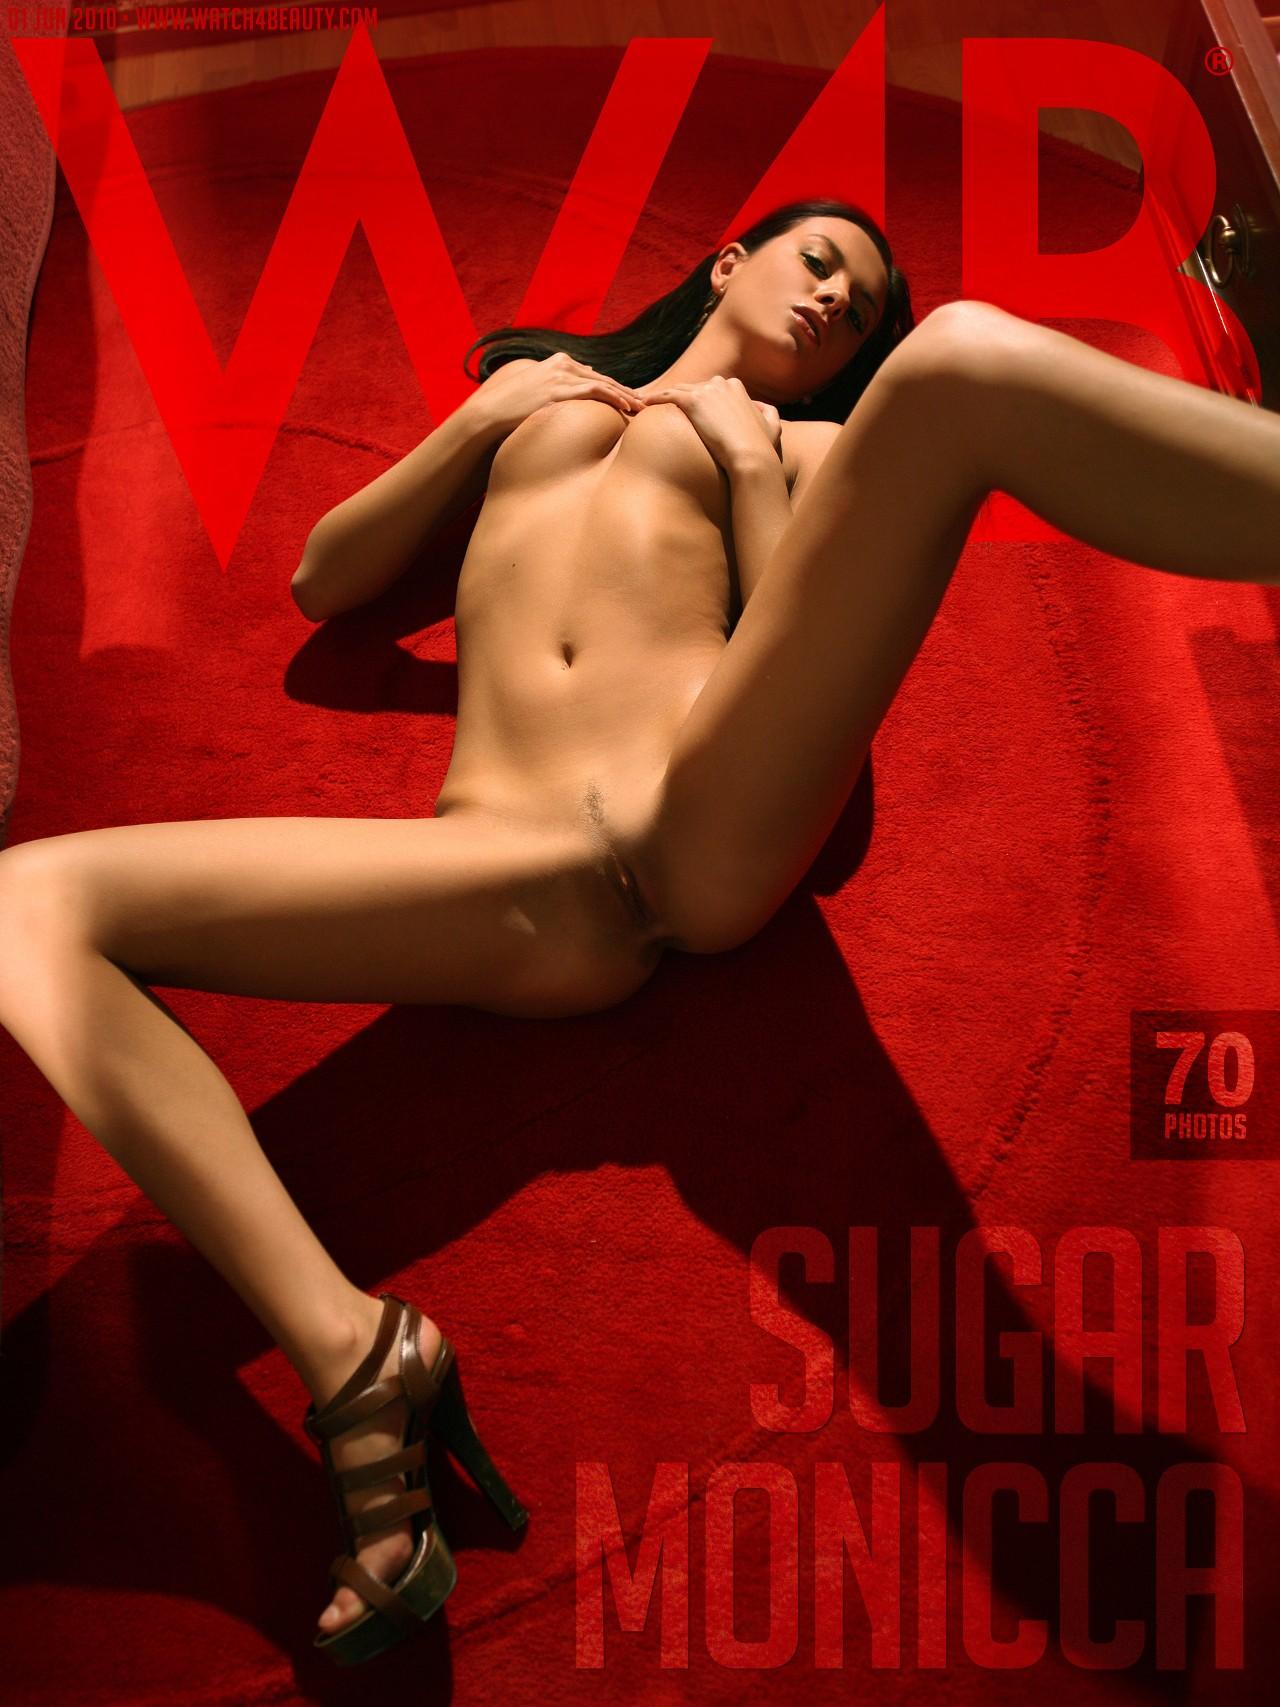 Monicca: Sugar